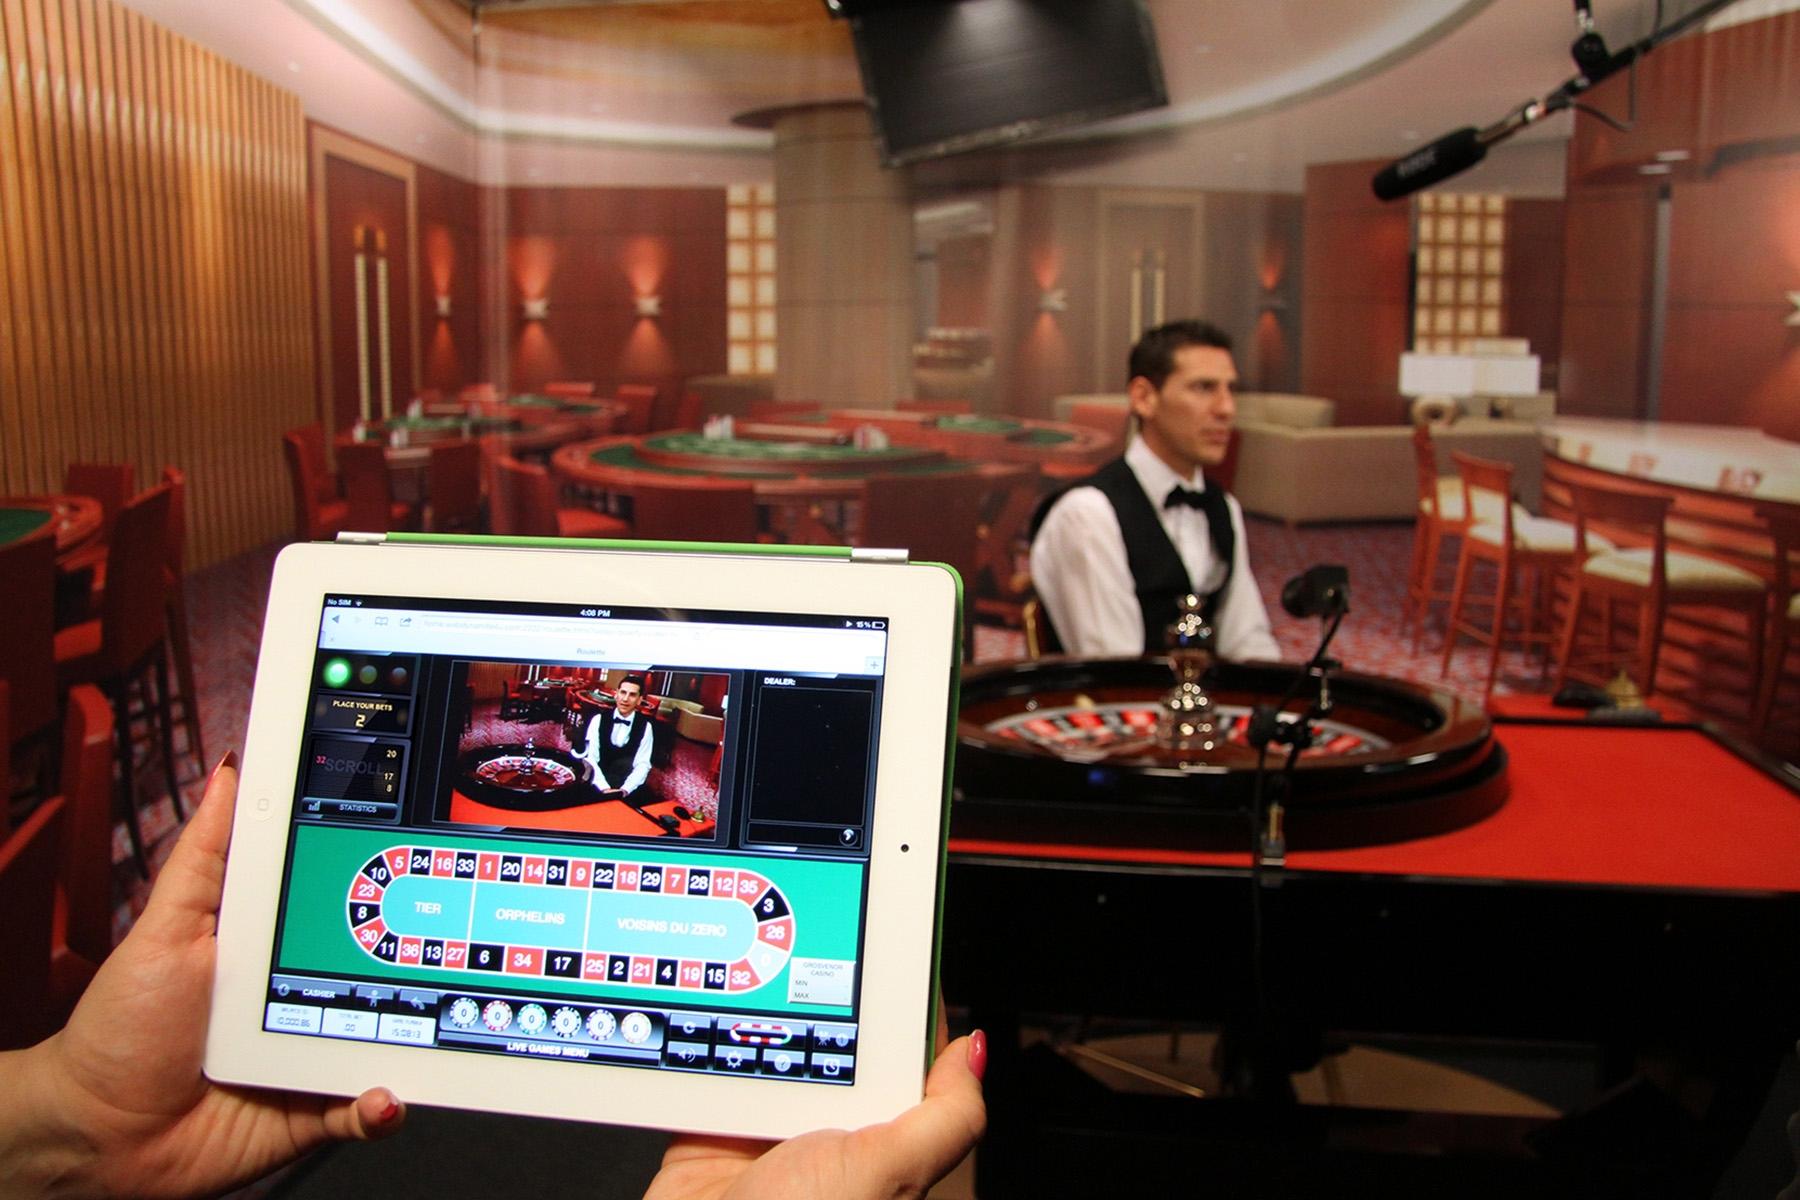 https://www.casinoz1.com/images/imagestore/30400/30327/origin/mobile_live_roulette-i30327.JPG